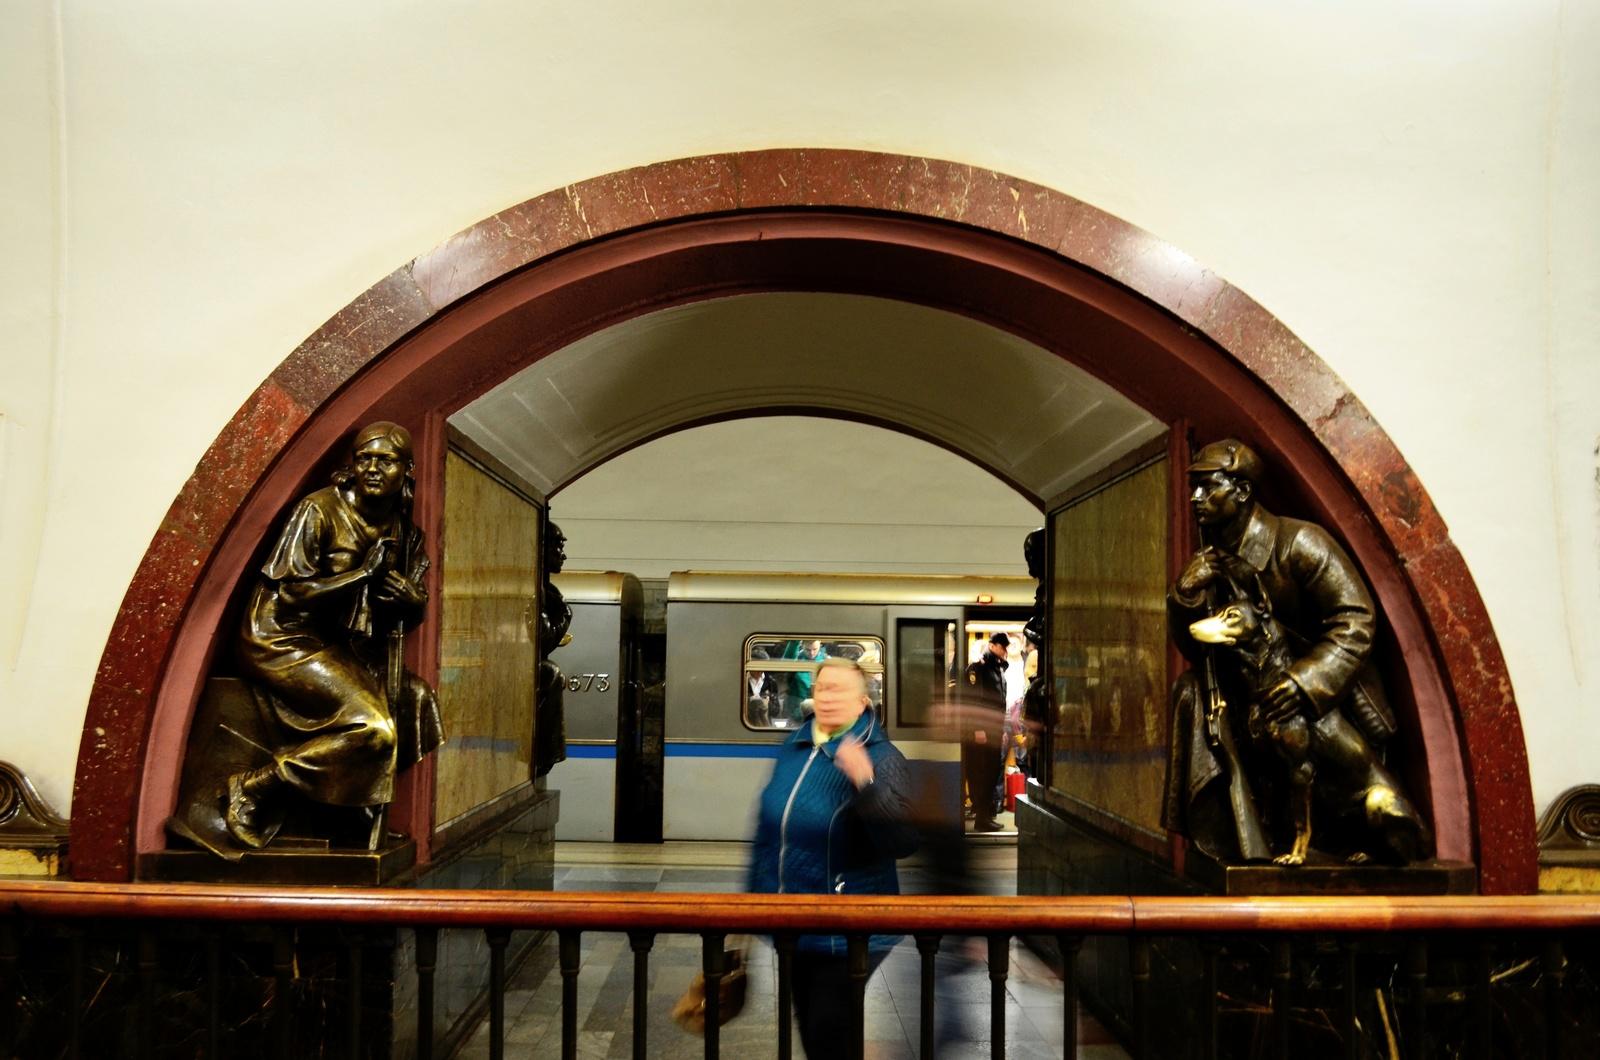 Ploshchad Revolyutsii estação Metro Moscovo Rússia - Diogo Pereira